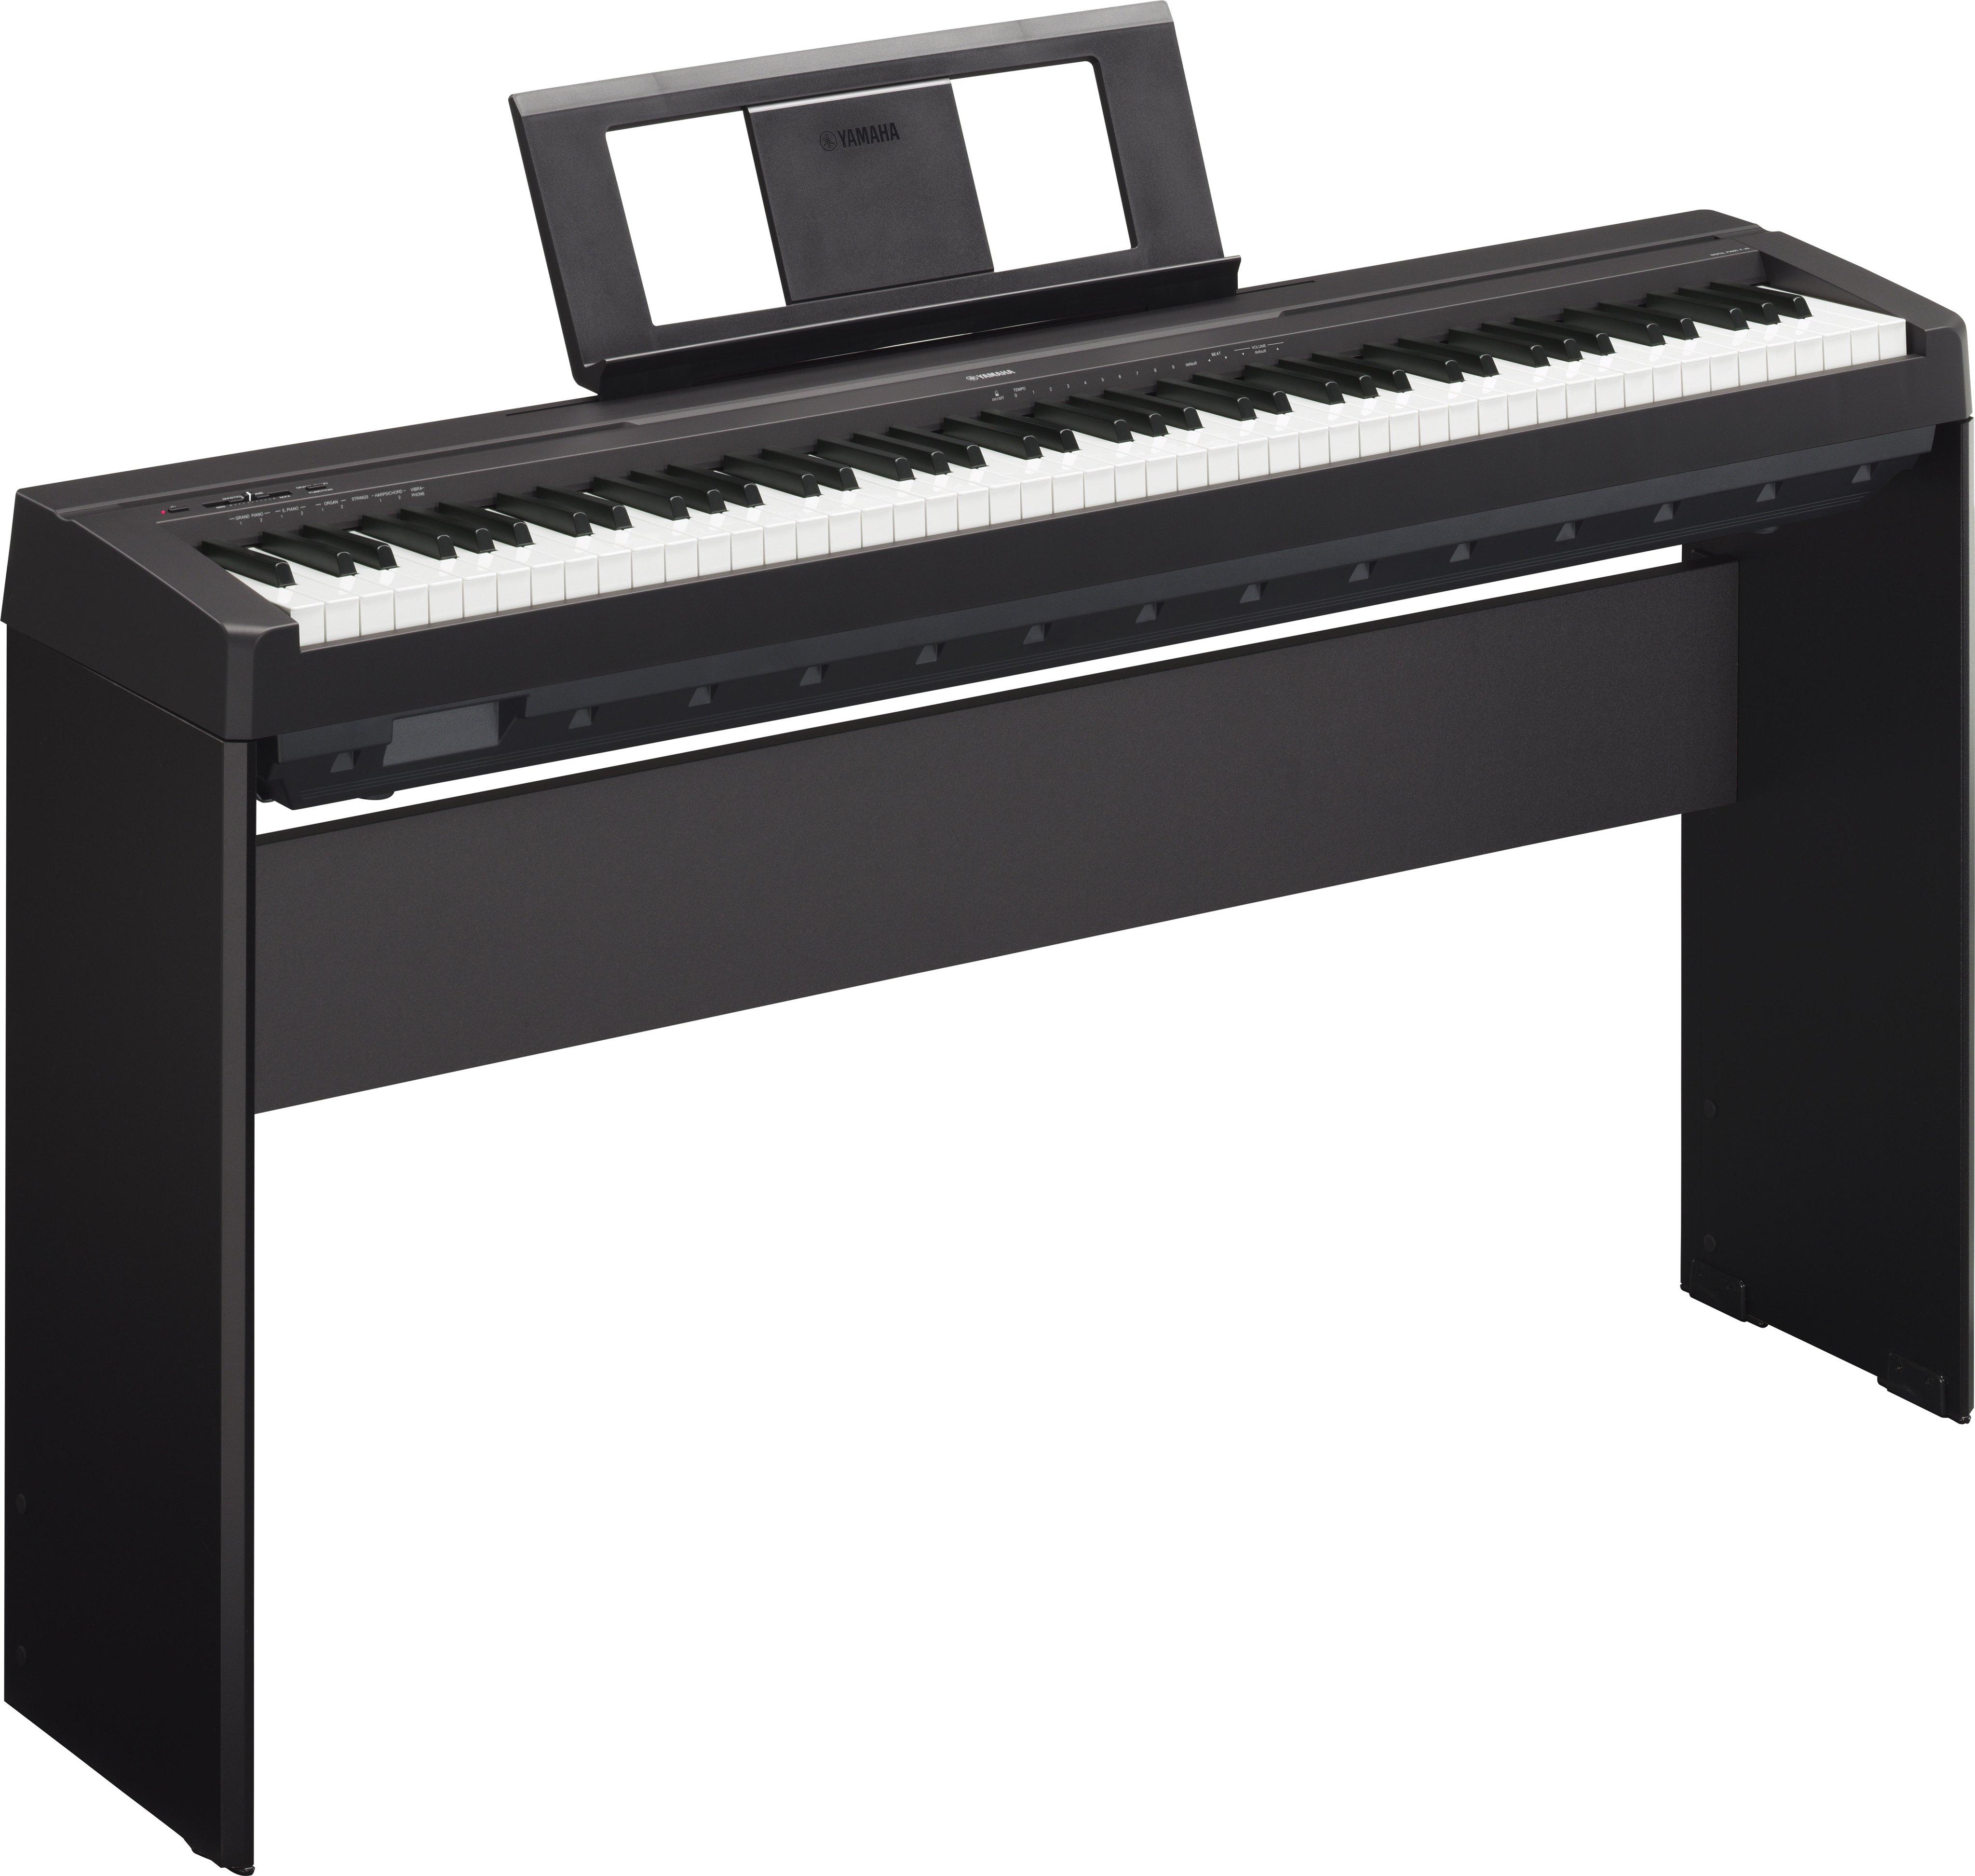 yamaha p 45 88 key digital piano de end 9 14 2021 12 00 am. Black Bedroom Furniture Sets. Home Design Ideas